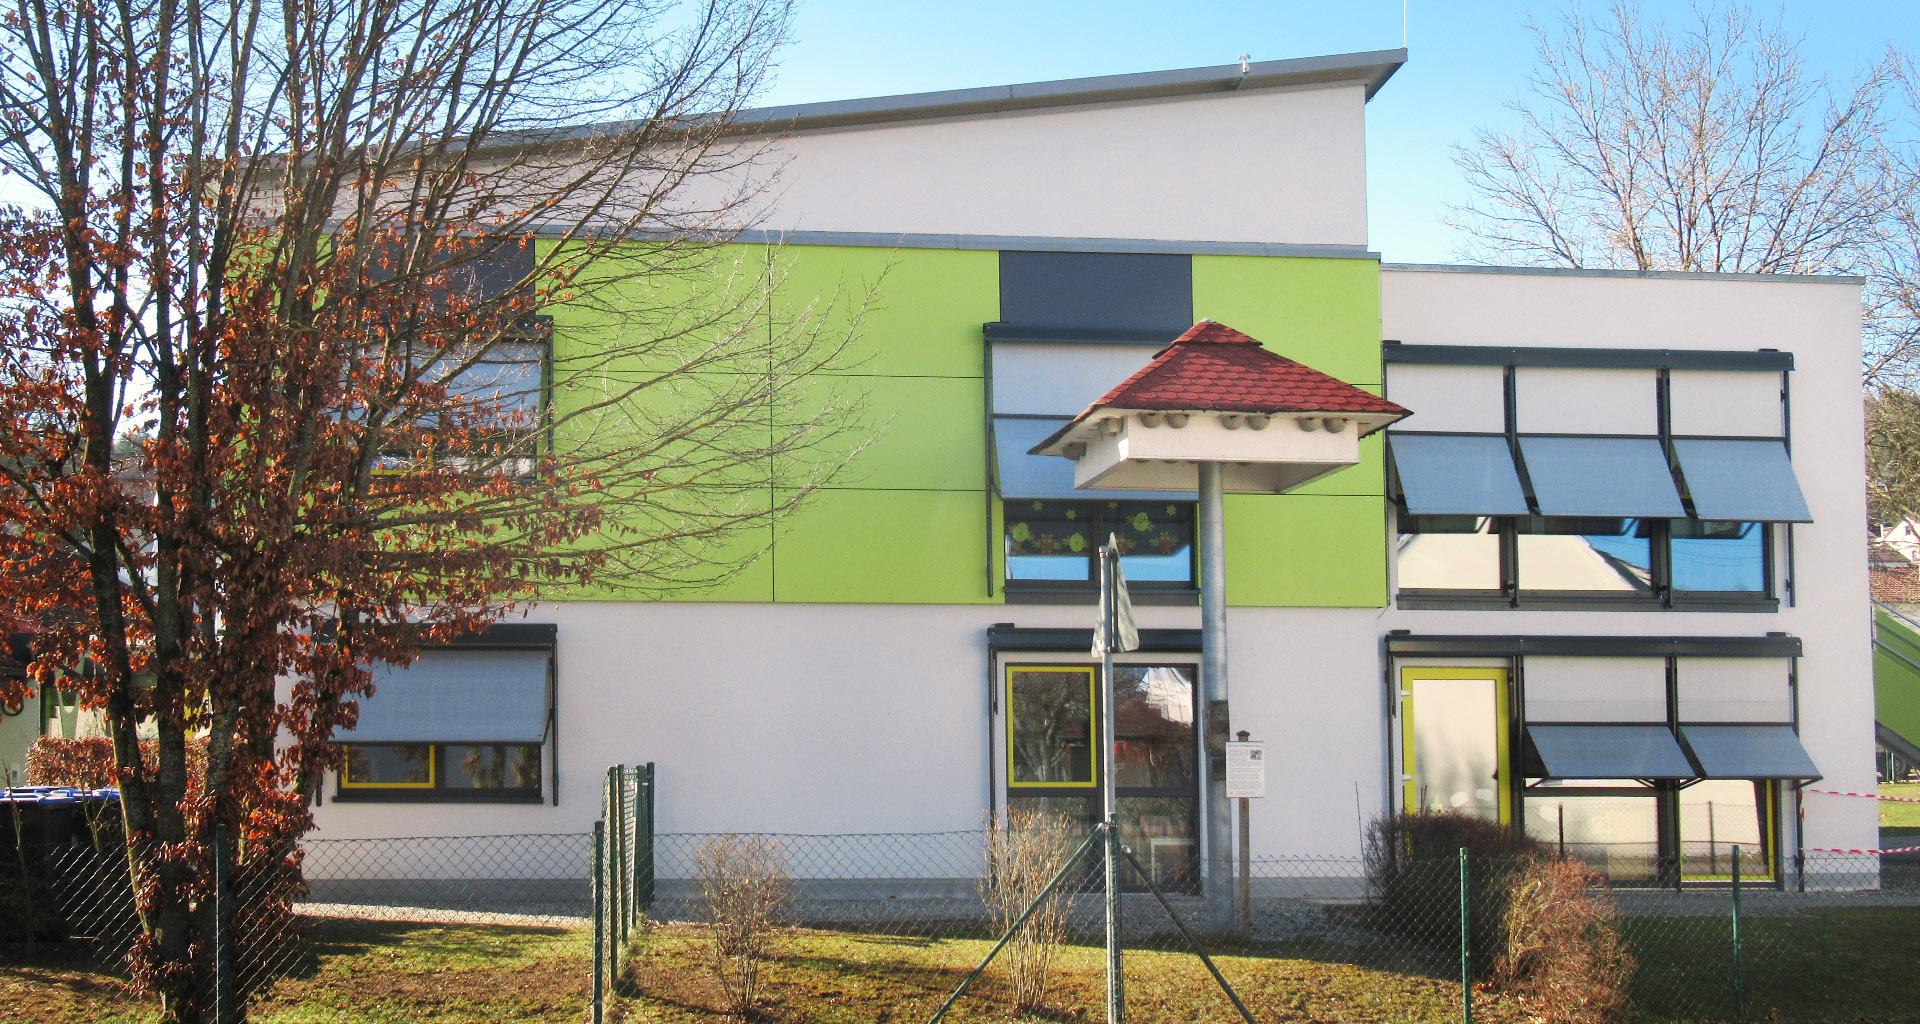 Kinderhaus Don Bosco